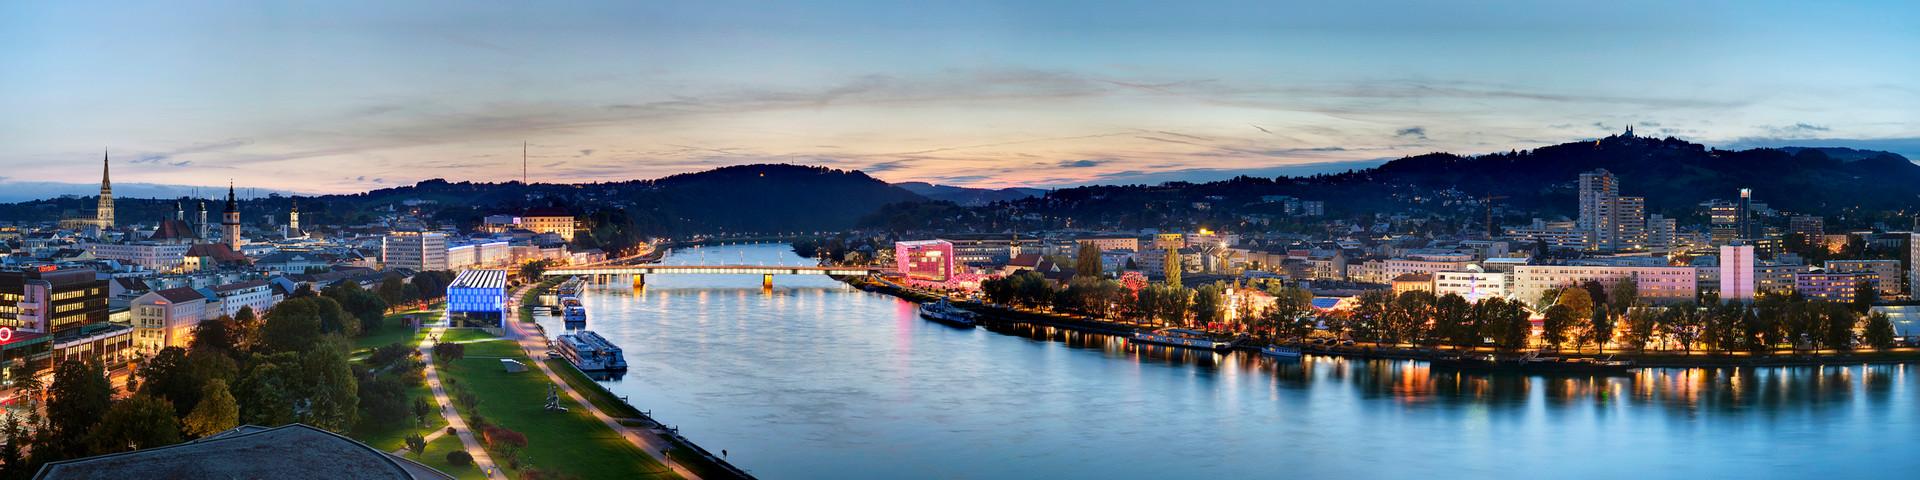 Linz Panorama © LinzTourismus - Johann Steininger